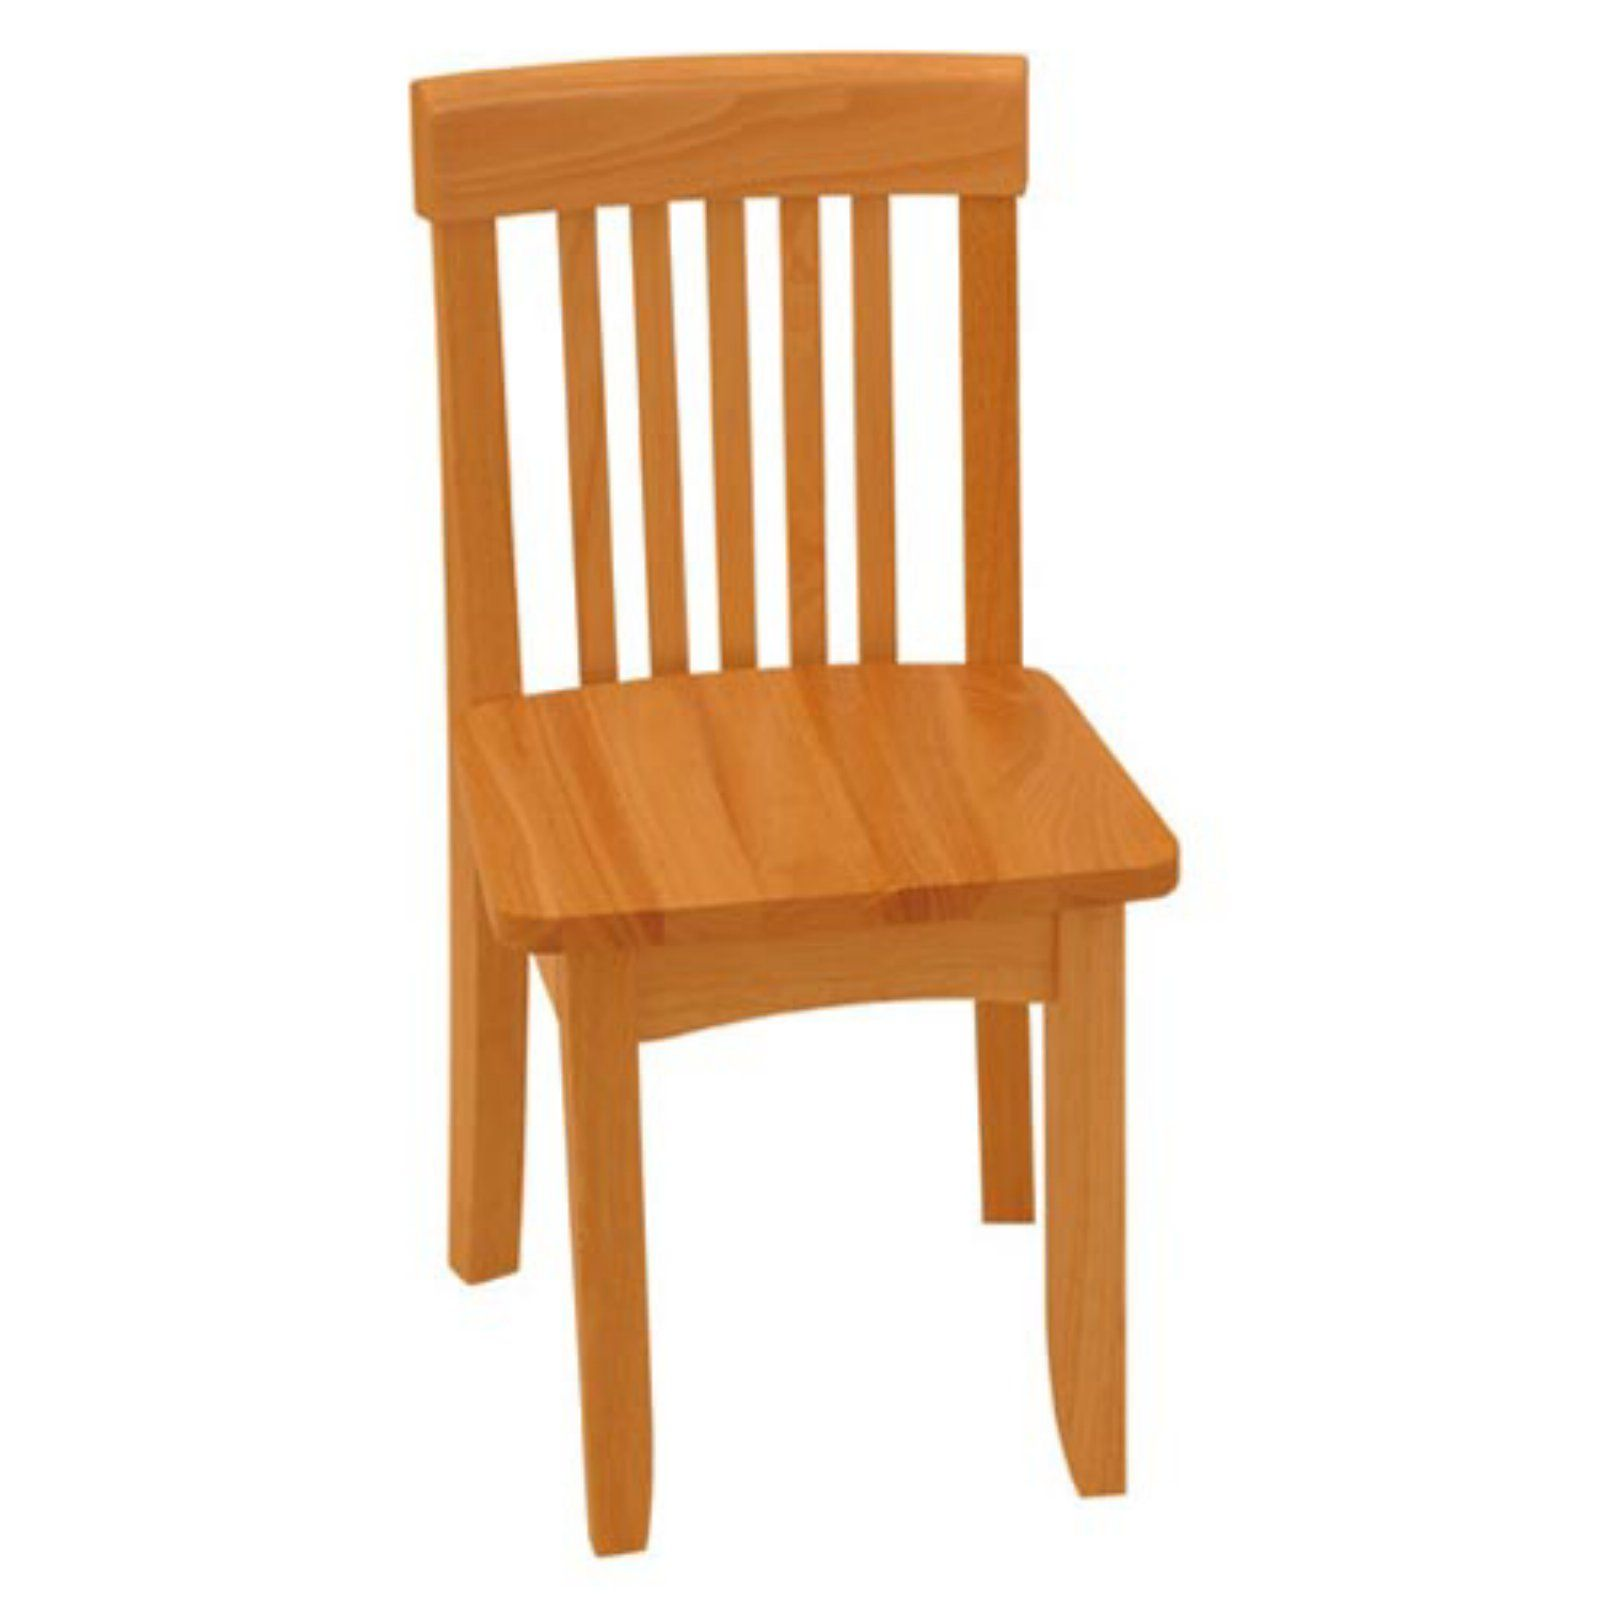 Remarkable Kidkraft Avalon Chair Honey Products In 2019 Kids Ncnpc Chair Design For Home Ncnpcorg